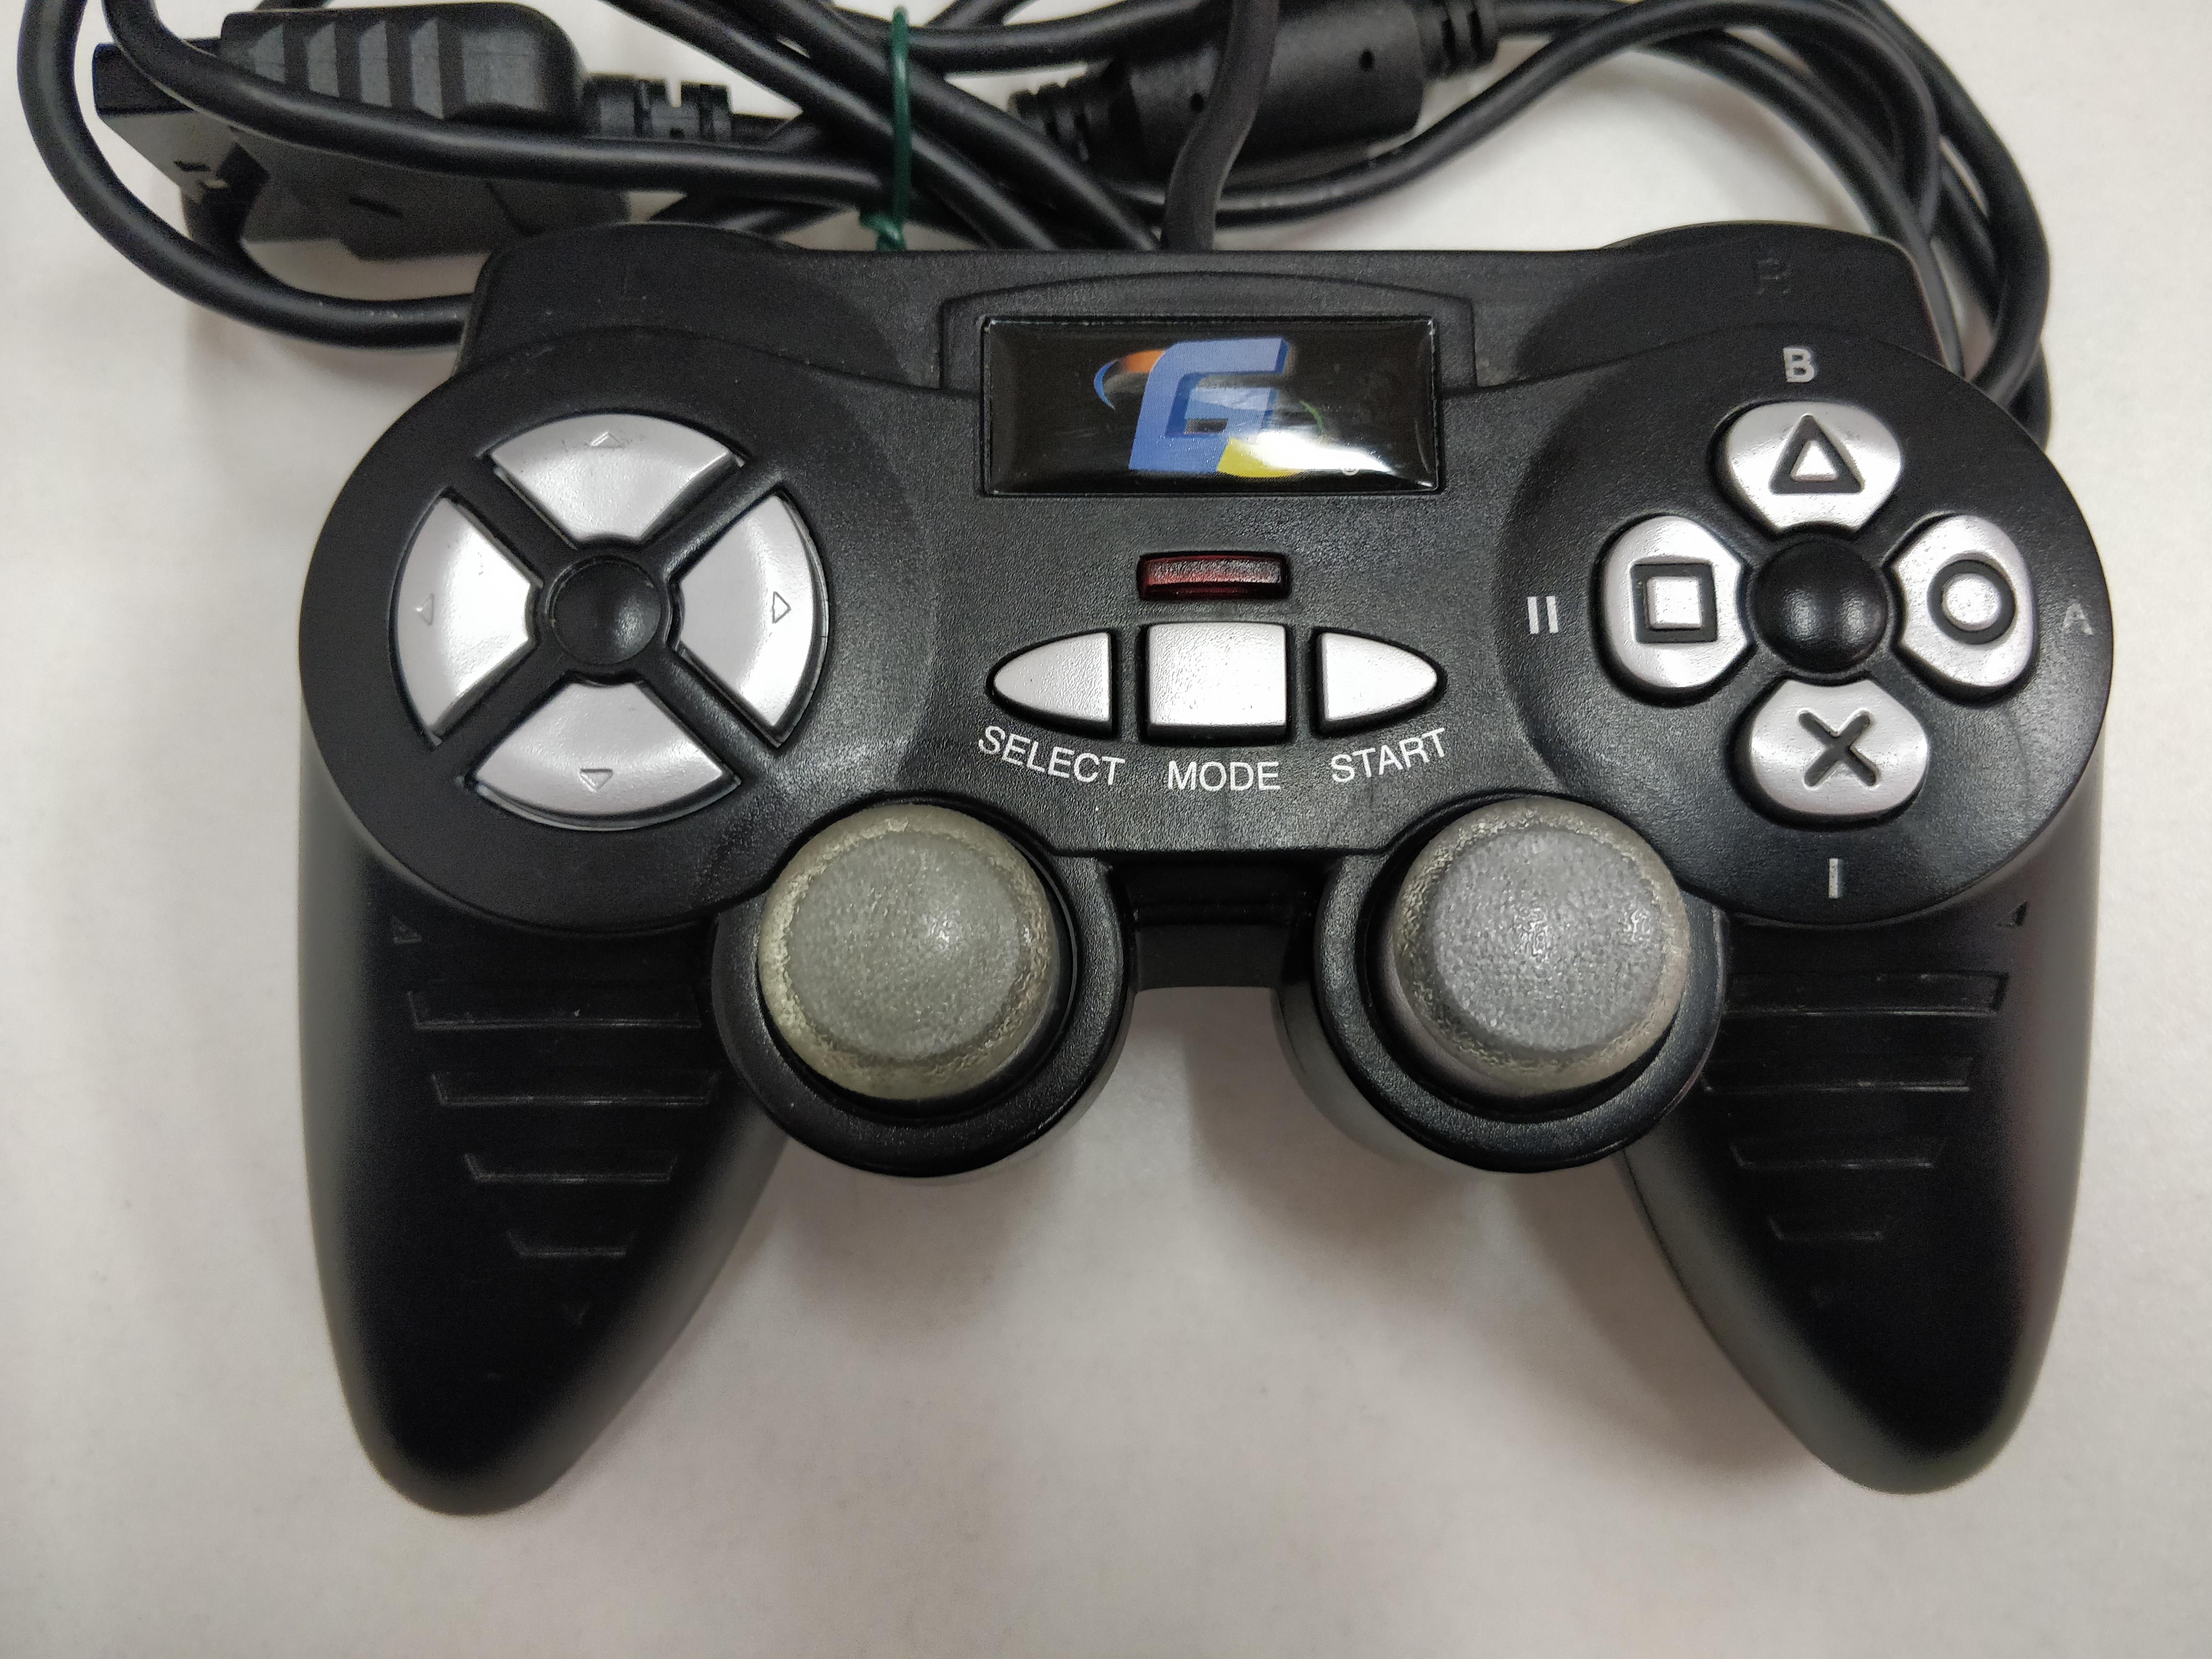 [PS2] Drátový Ovladač Gamester - černý (estetická vada)